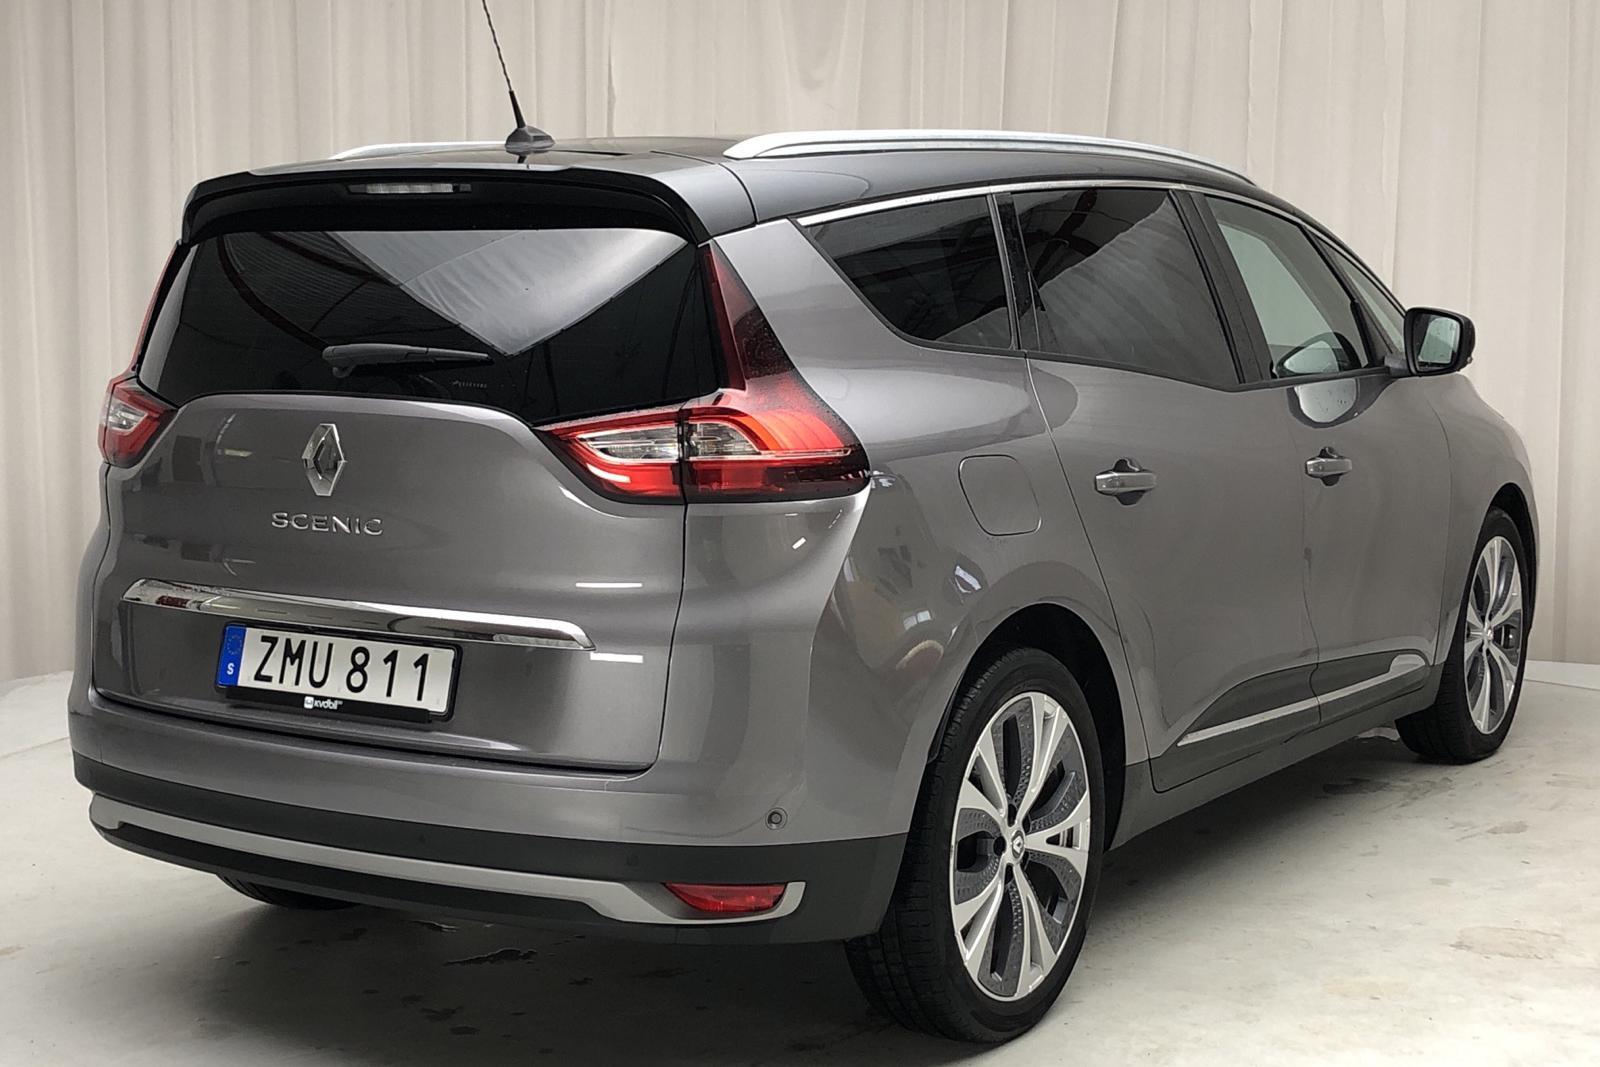 Renault Grand Scénic 1.6 dCi (130hk) - 0 mil - Manuell - Dark Grey